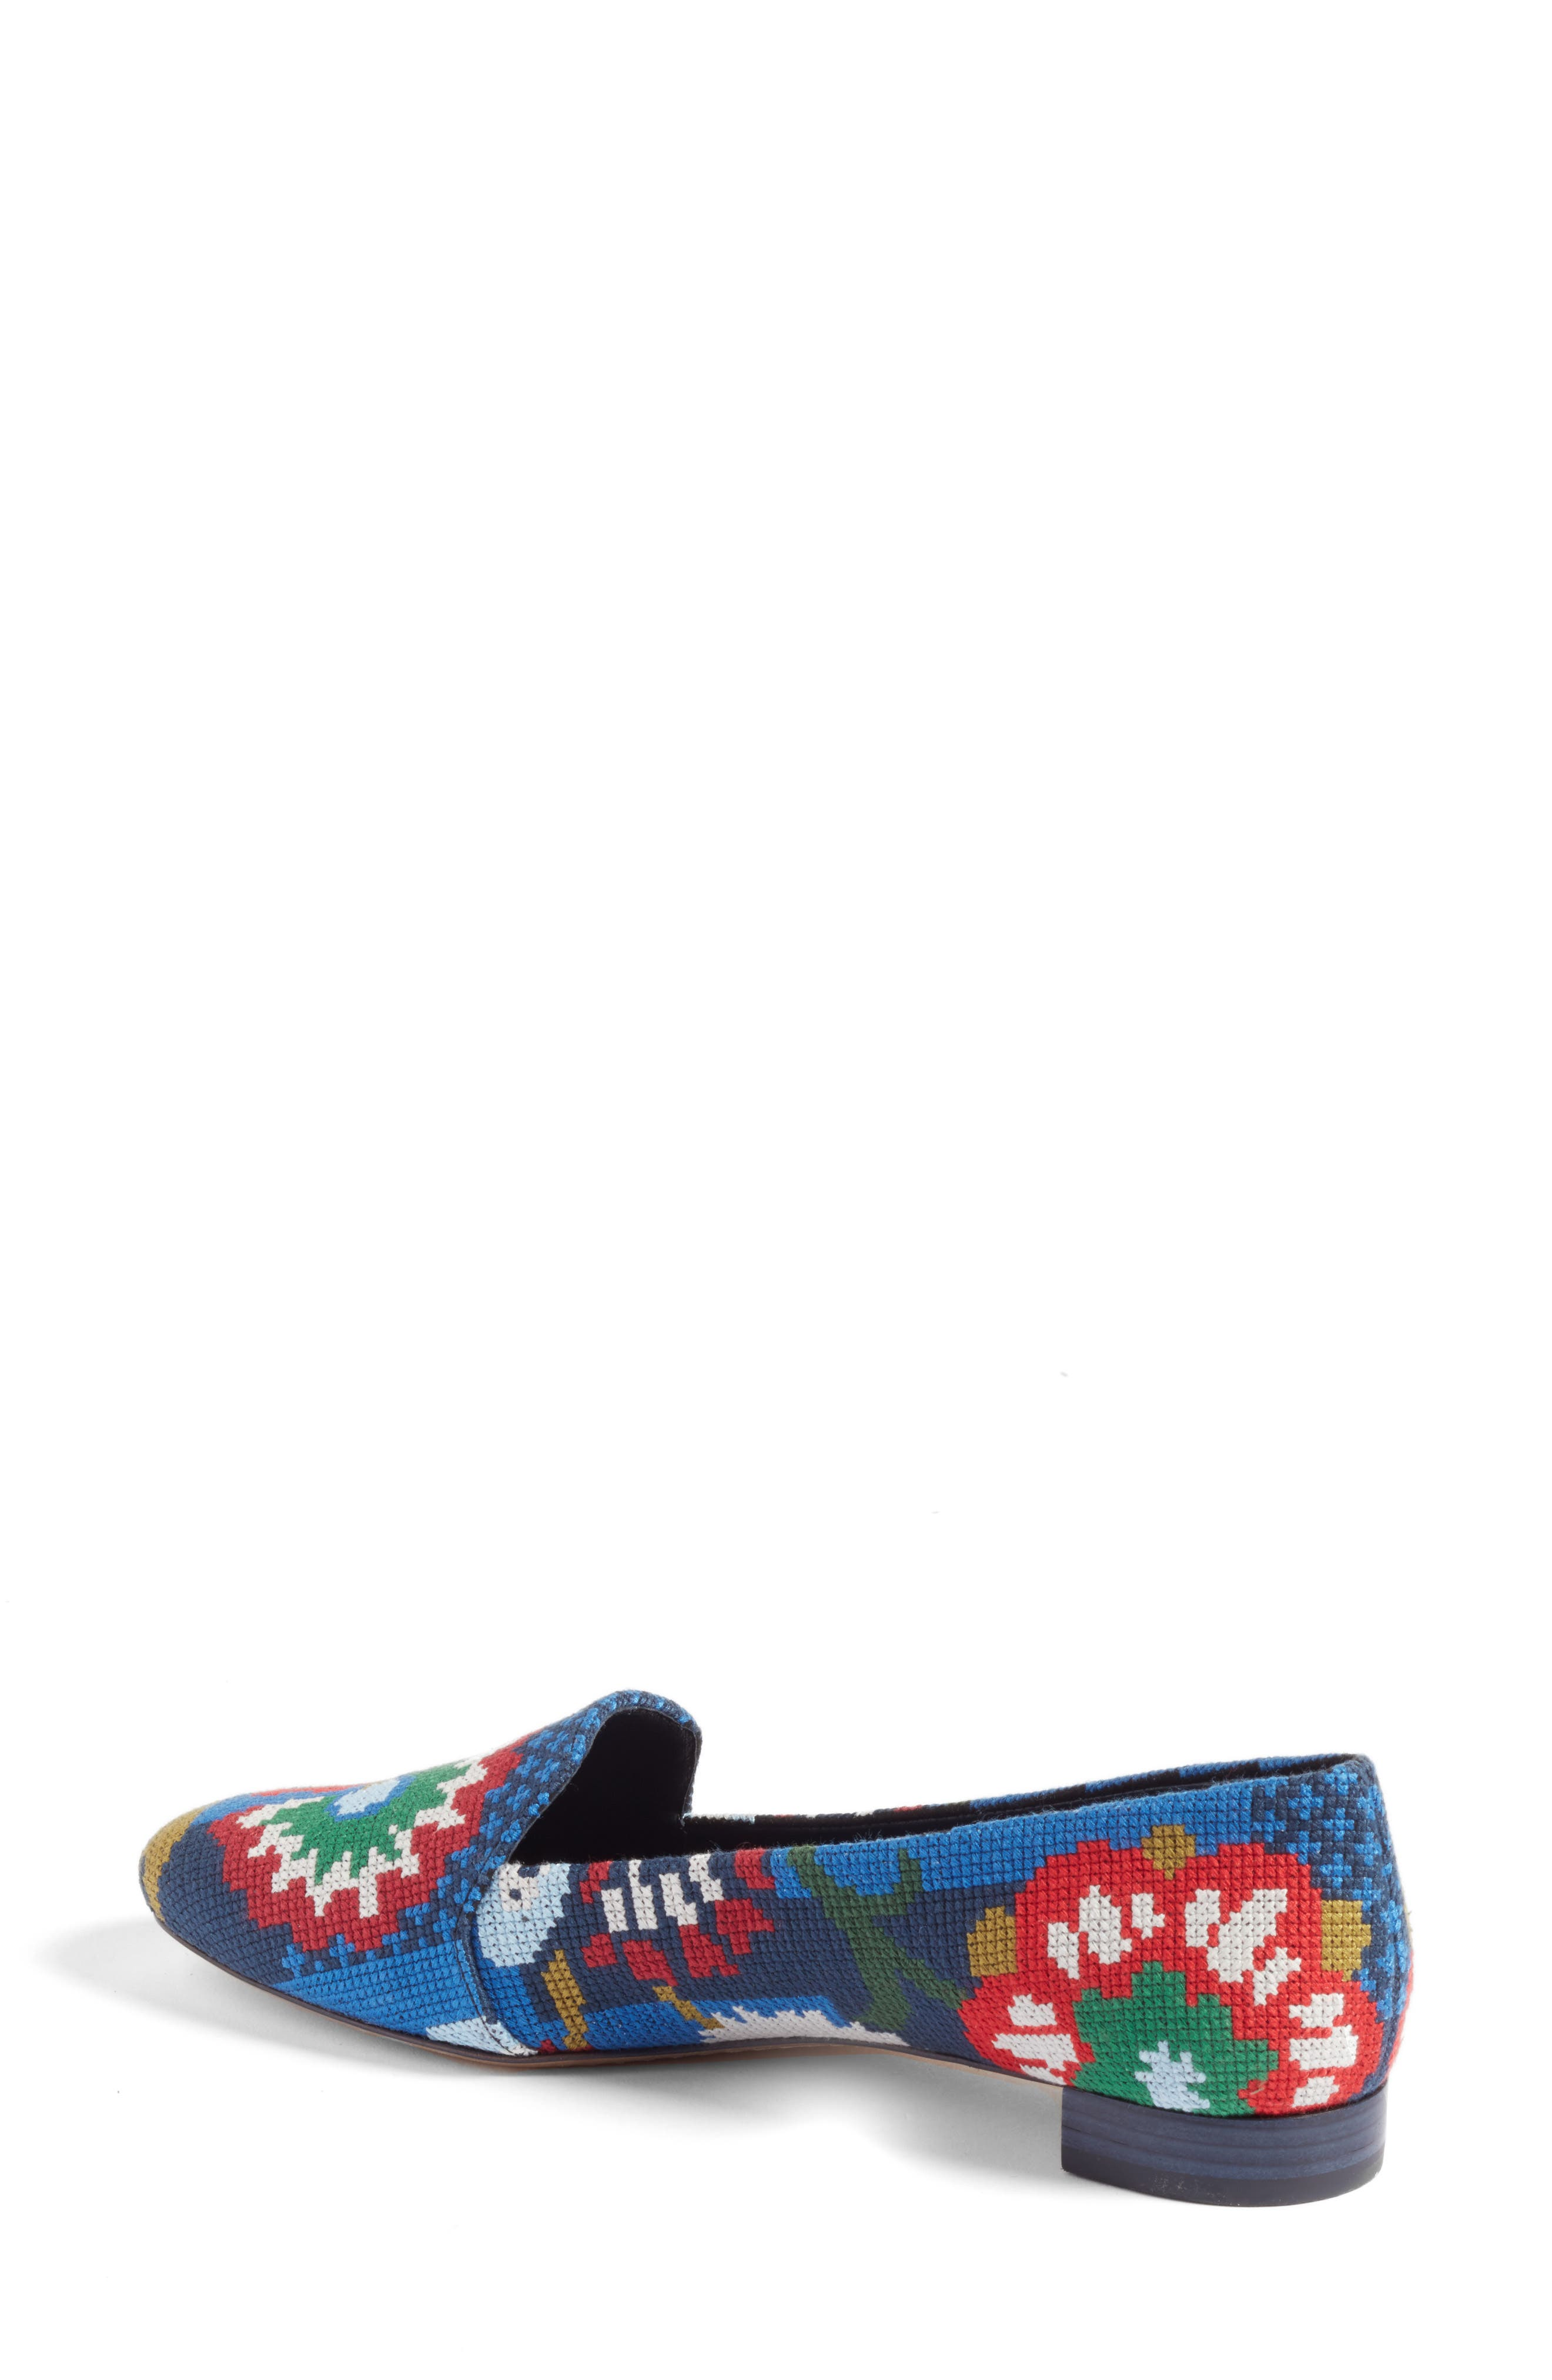 Alternate Image 2  - Tory Burch Sadie Floral Cross Stitch Loafer (Women)